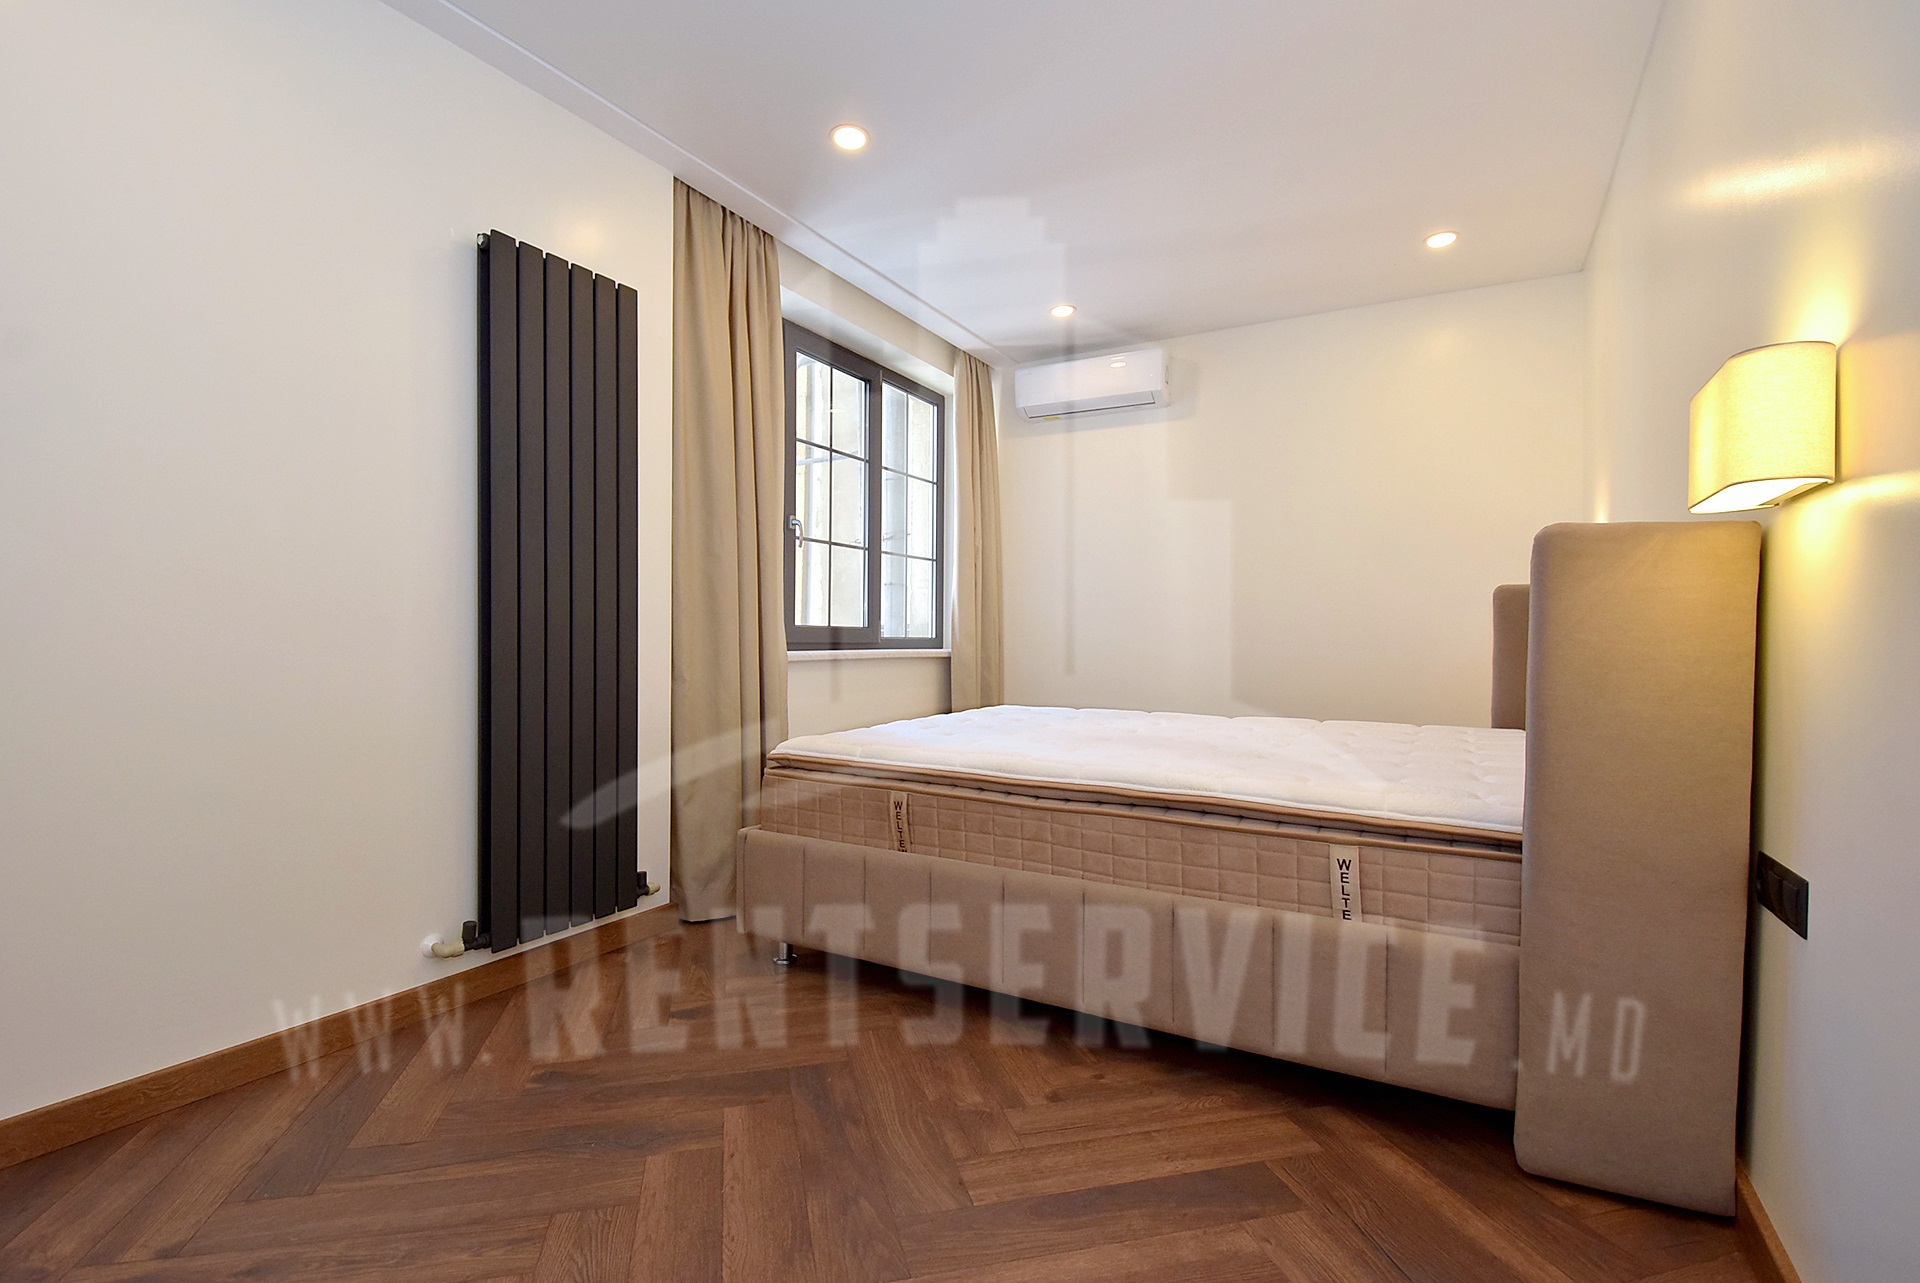 289_apartment_8.JPG